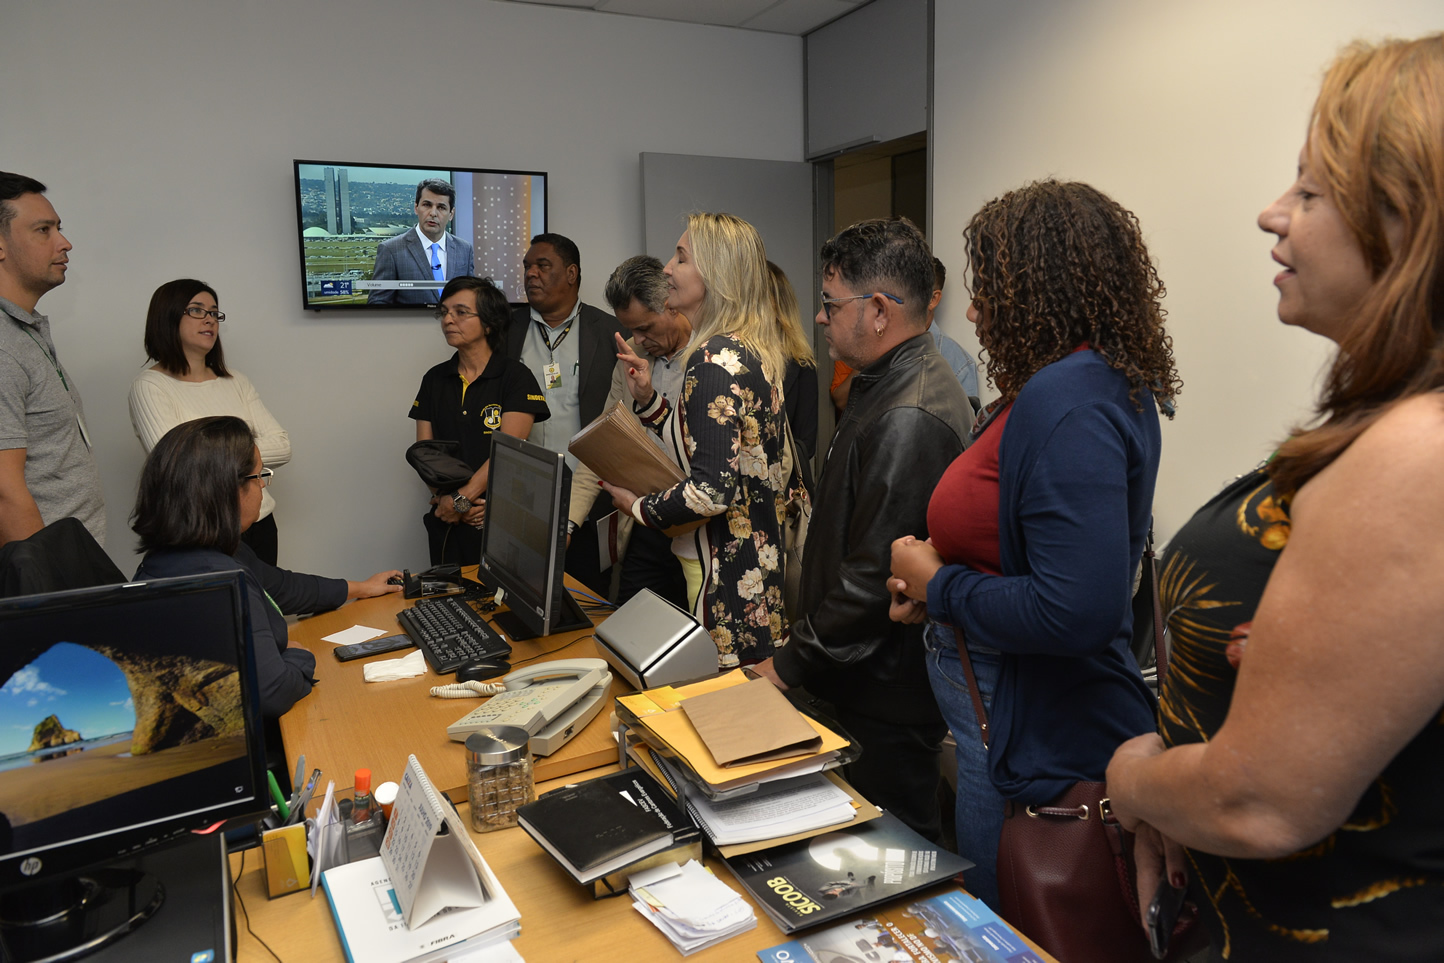 2019.06.13_Visita-aos-gabinetes-contra-o-fim-da-licenca-premio_fotos-Deva-Garcia-17